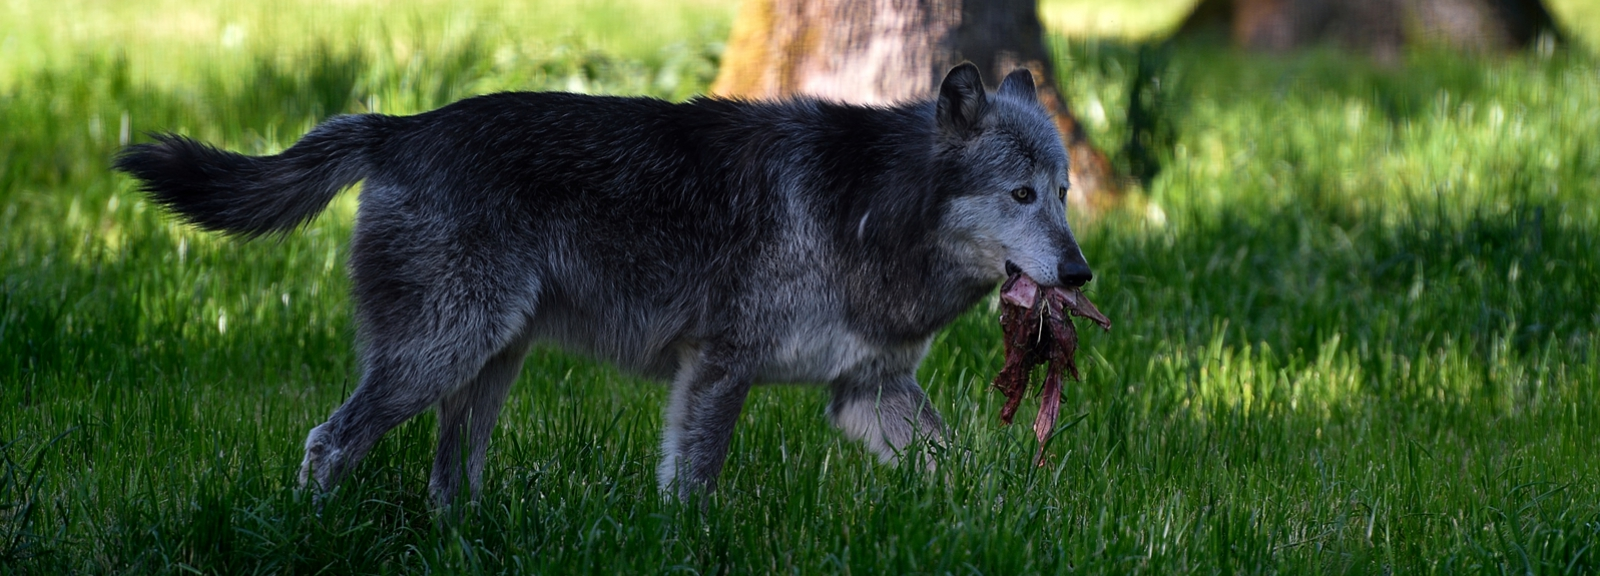 Loup de Mackensie © MNHN - F-G Grandin